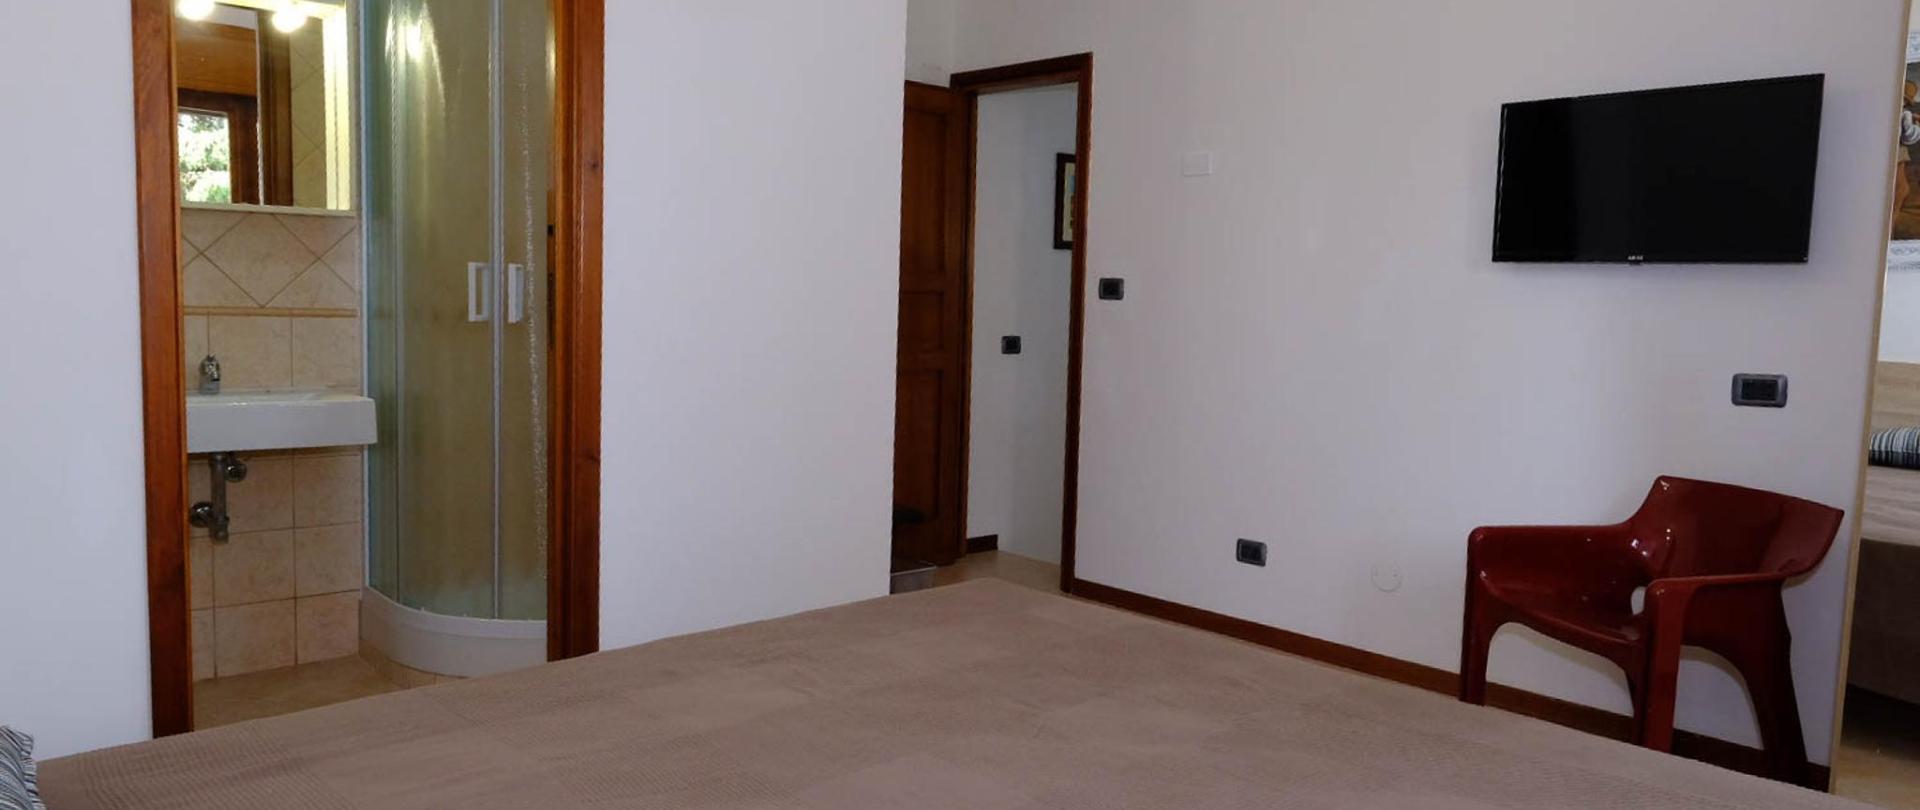 EMPORIUM GUEST HOUSE ROOM 4.jpg